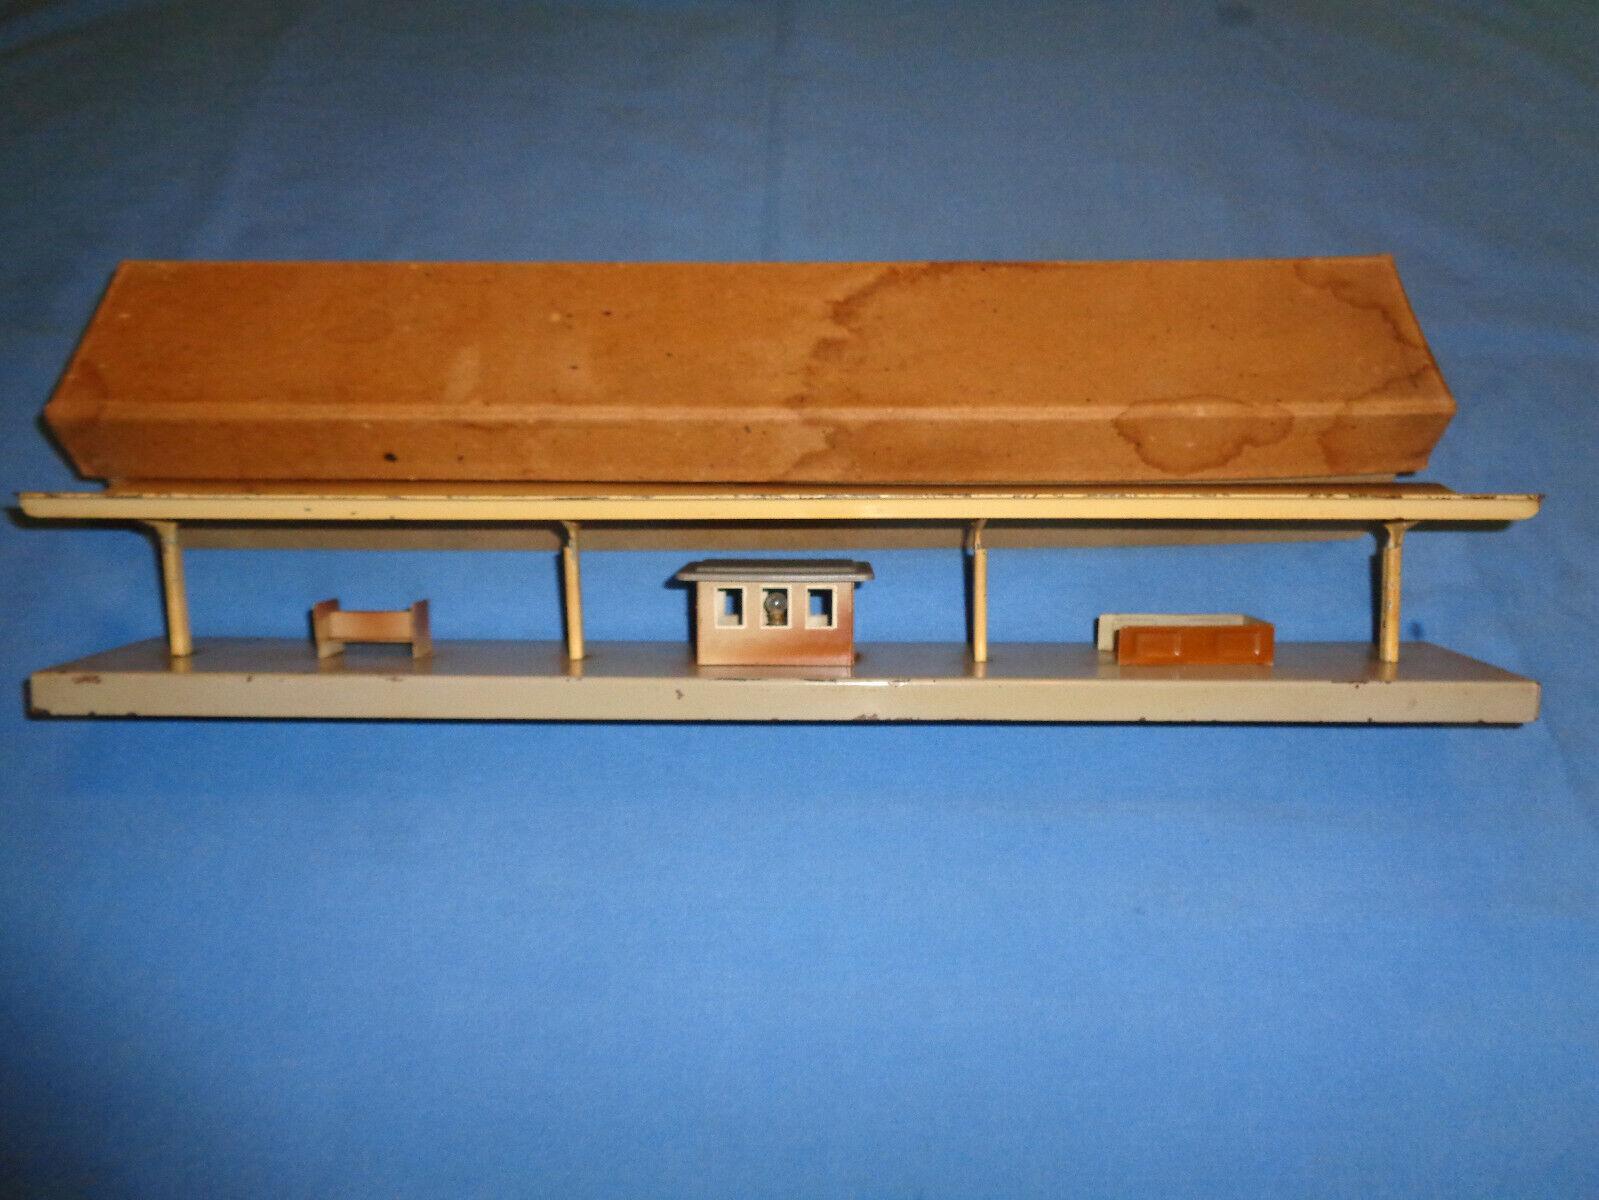 Vintage Marklin #423 Railroad, Train Passenger Station with Original Box.